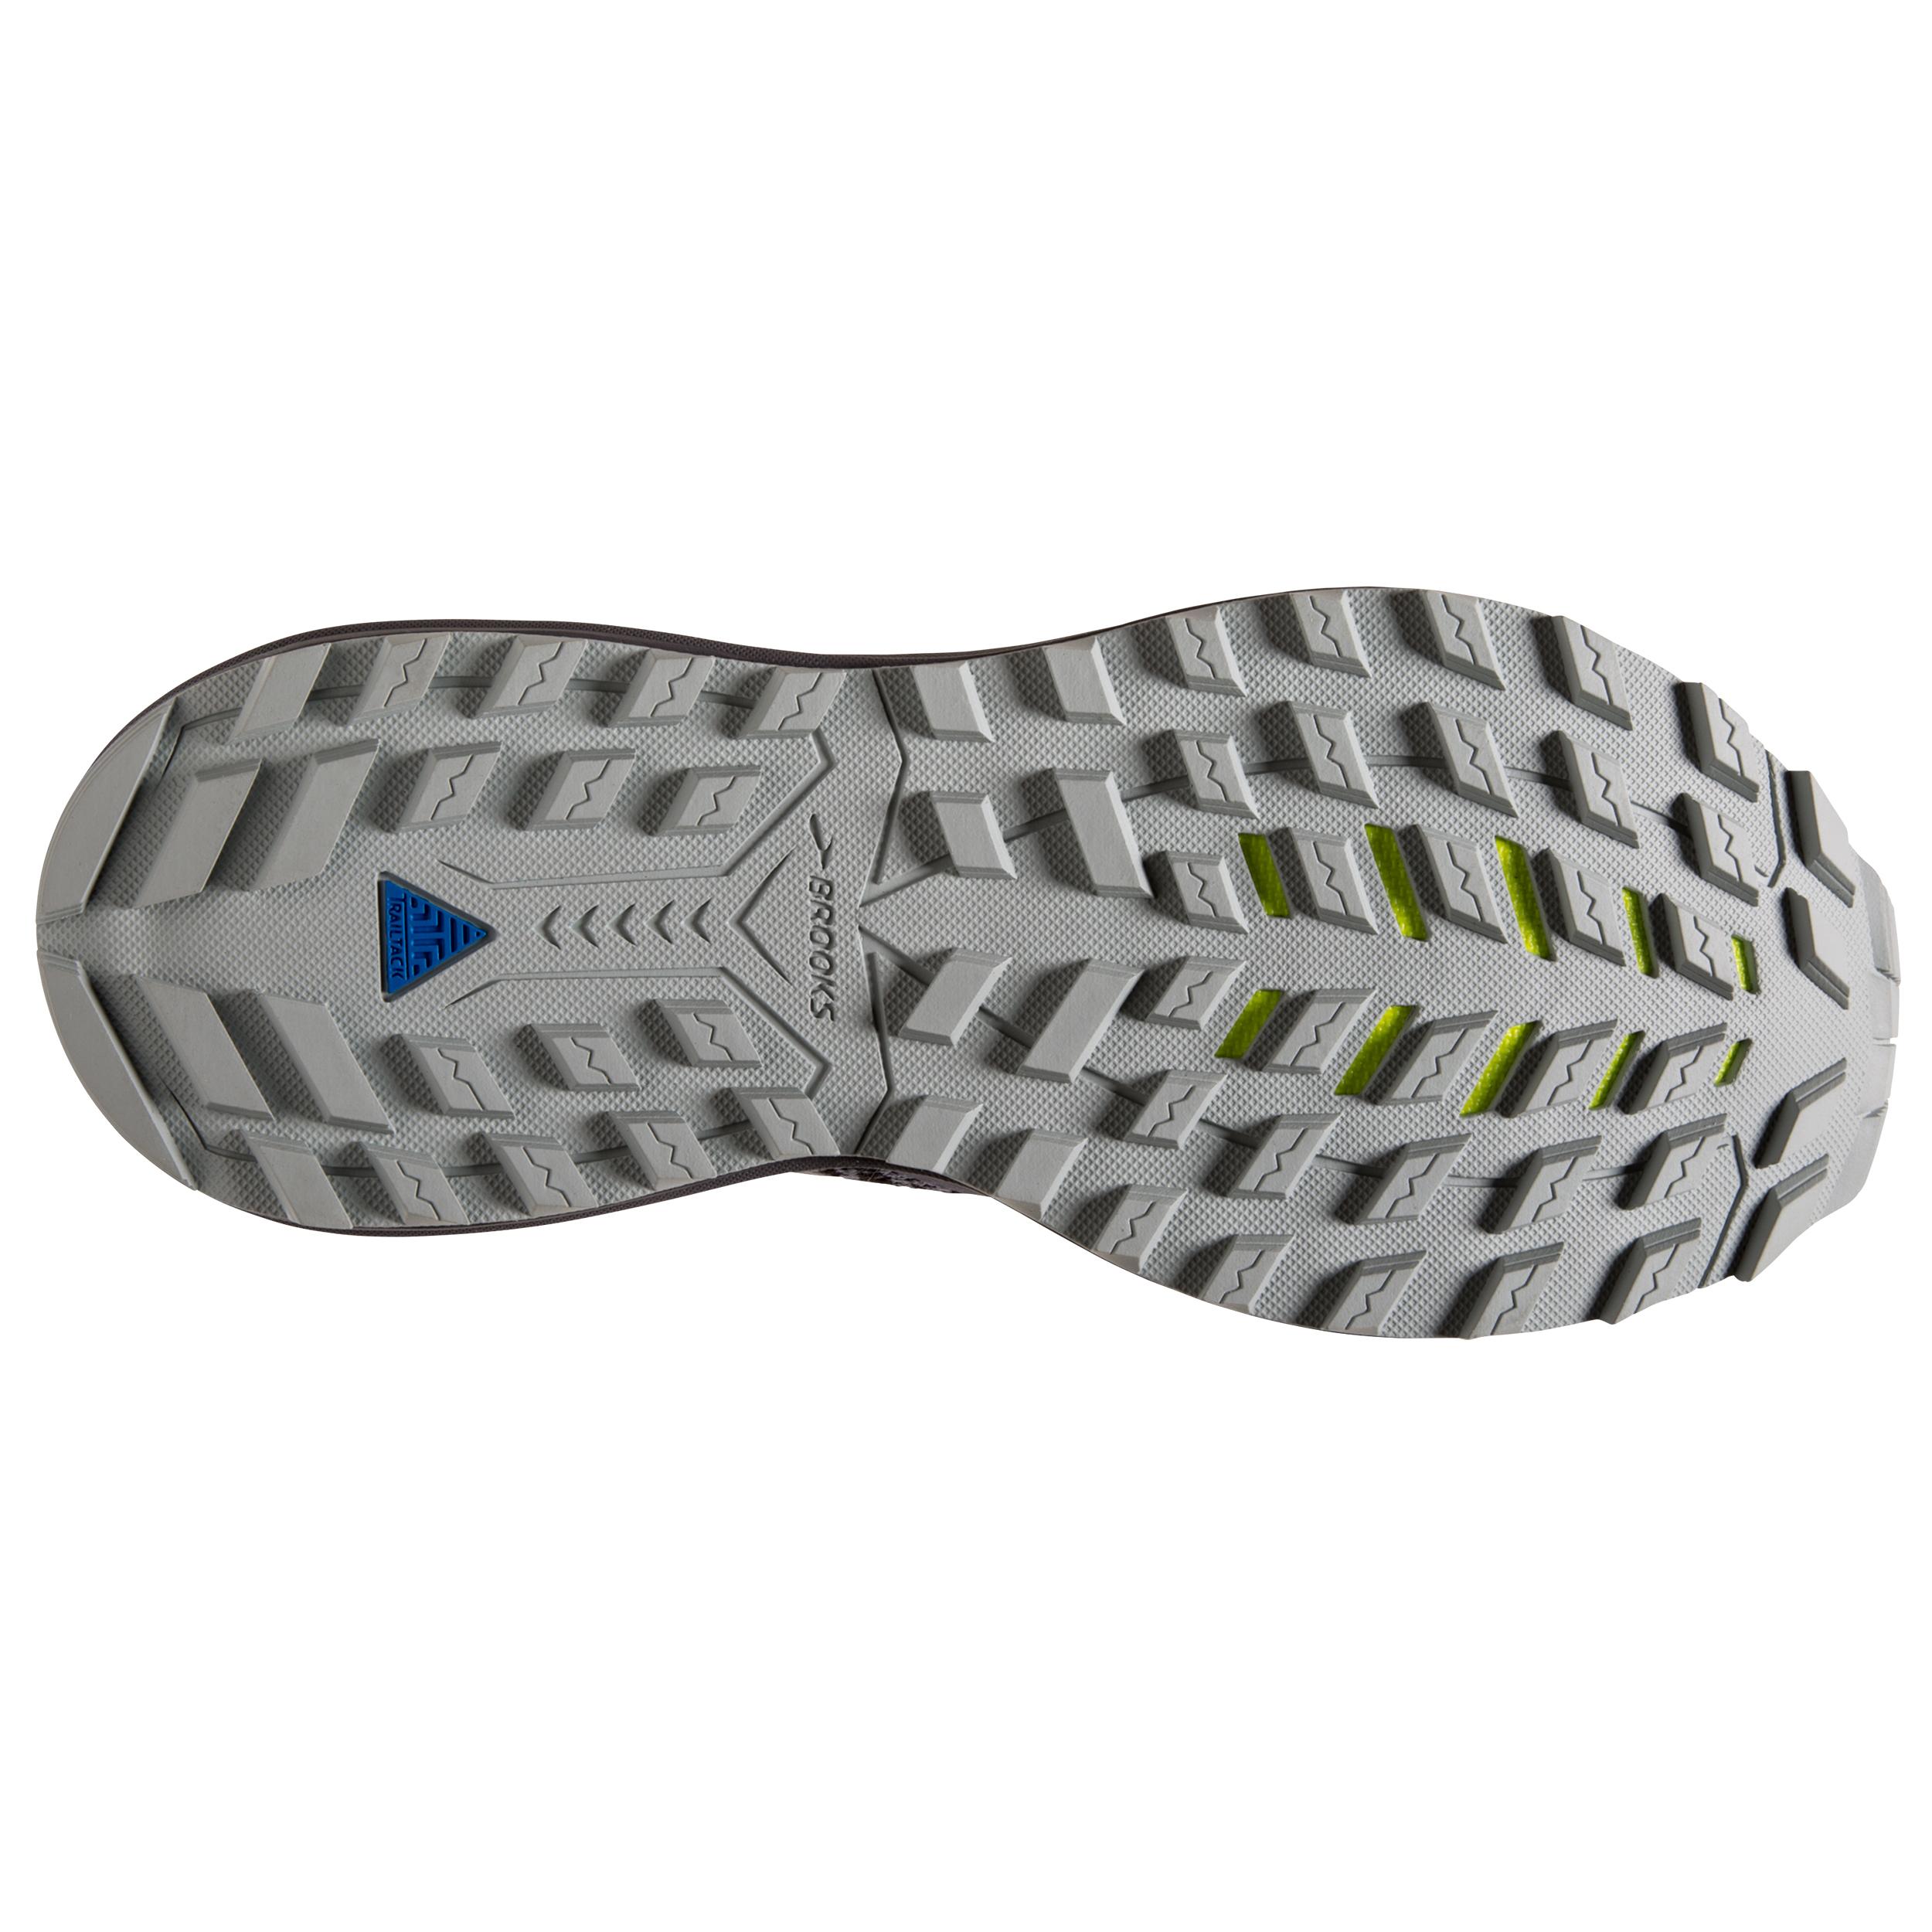 1053e396 Brooks Cascadia 14 Trail Running Shoes - Women's   MEC